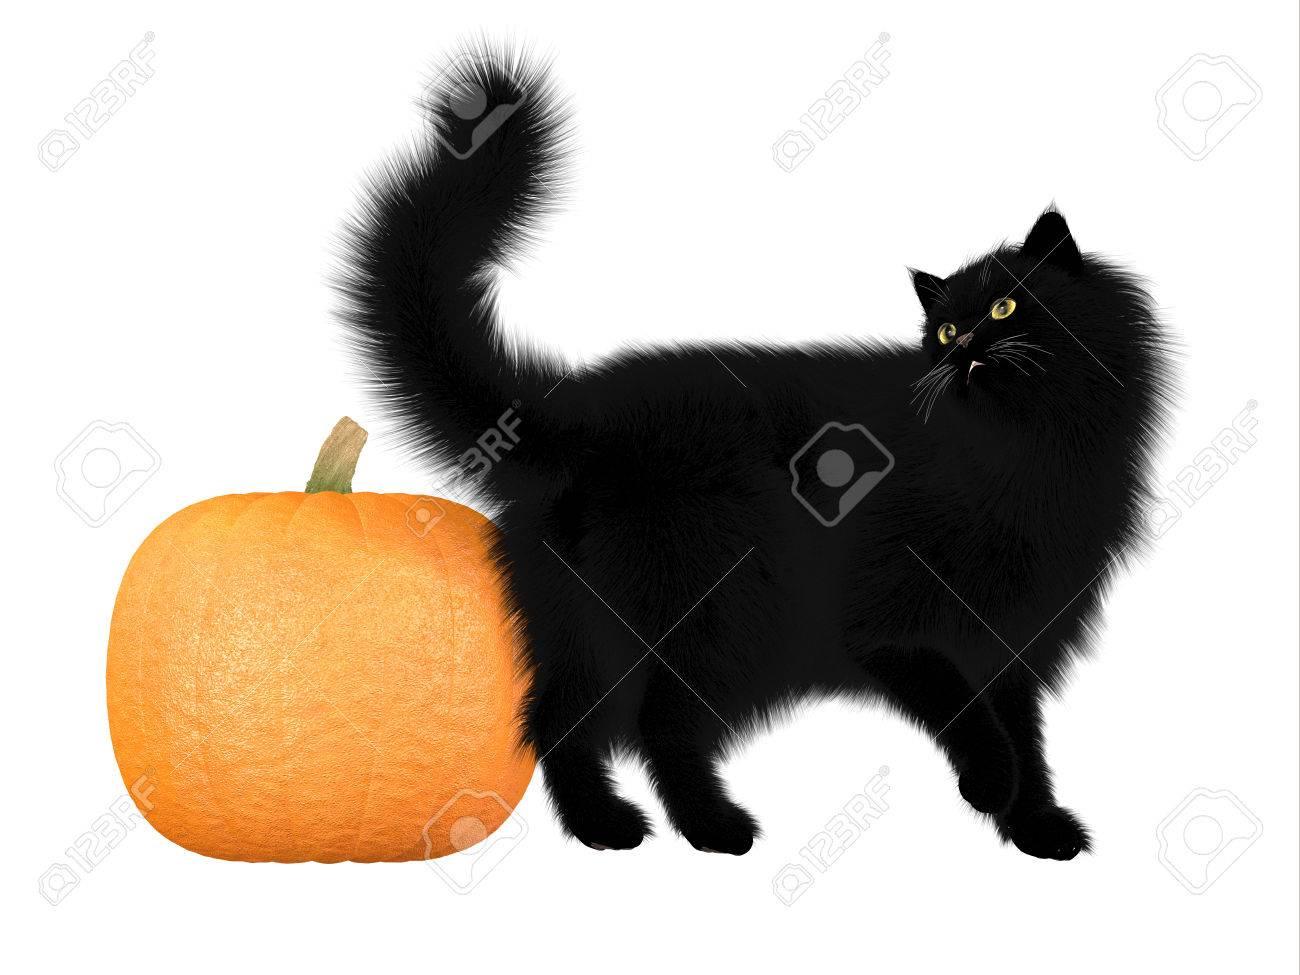 Halloween Black Cat and Pumpkin - The black cat and pumpkins are a symbol of autumn seasonal Halloween festivities Stock Photo - 23905261